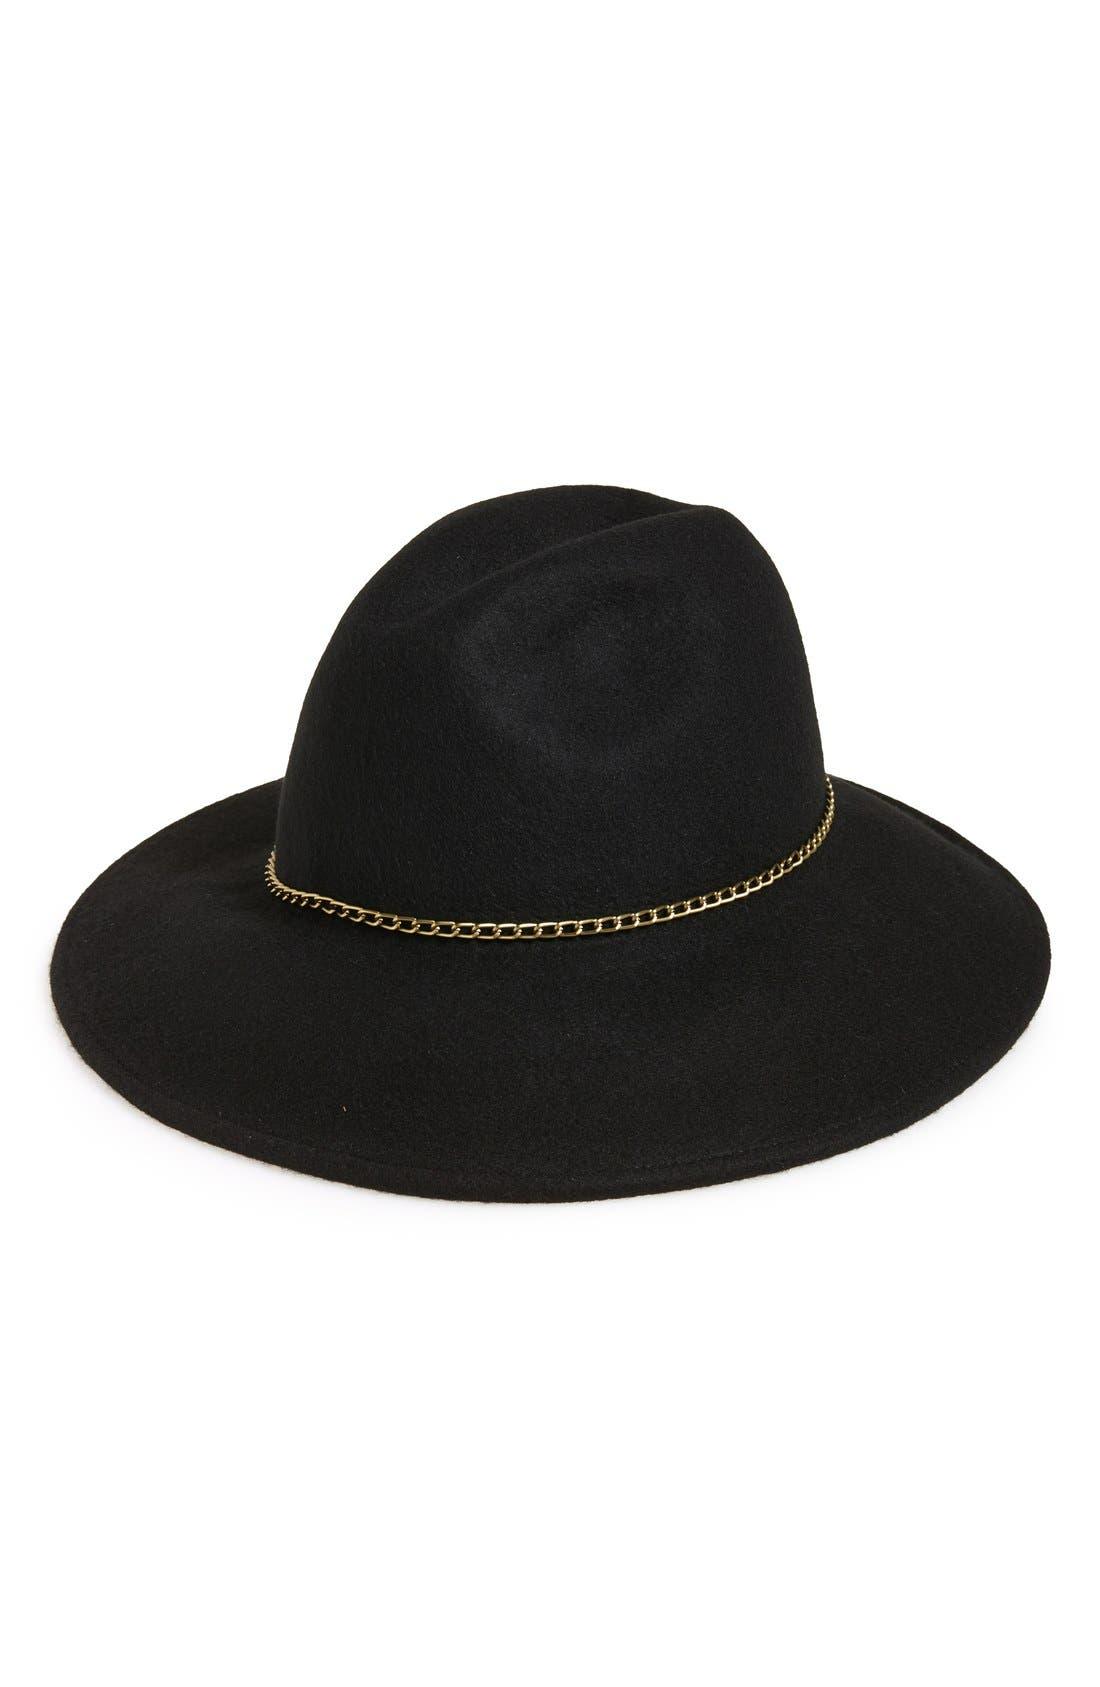 Chain Trim Panama Hat,                             Main thumbnail 1, color,                             001